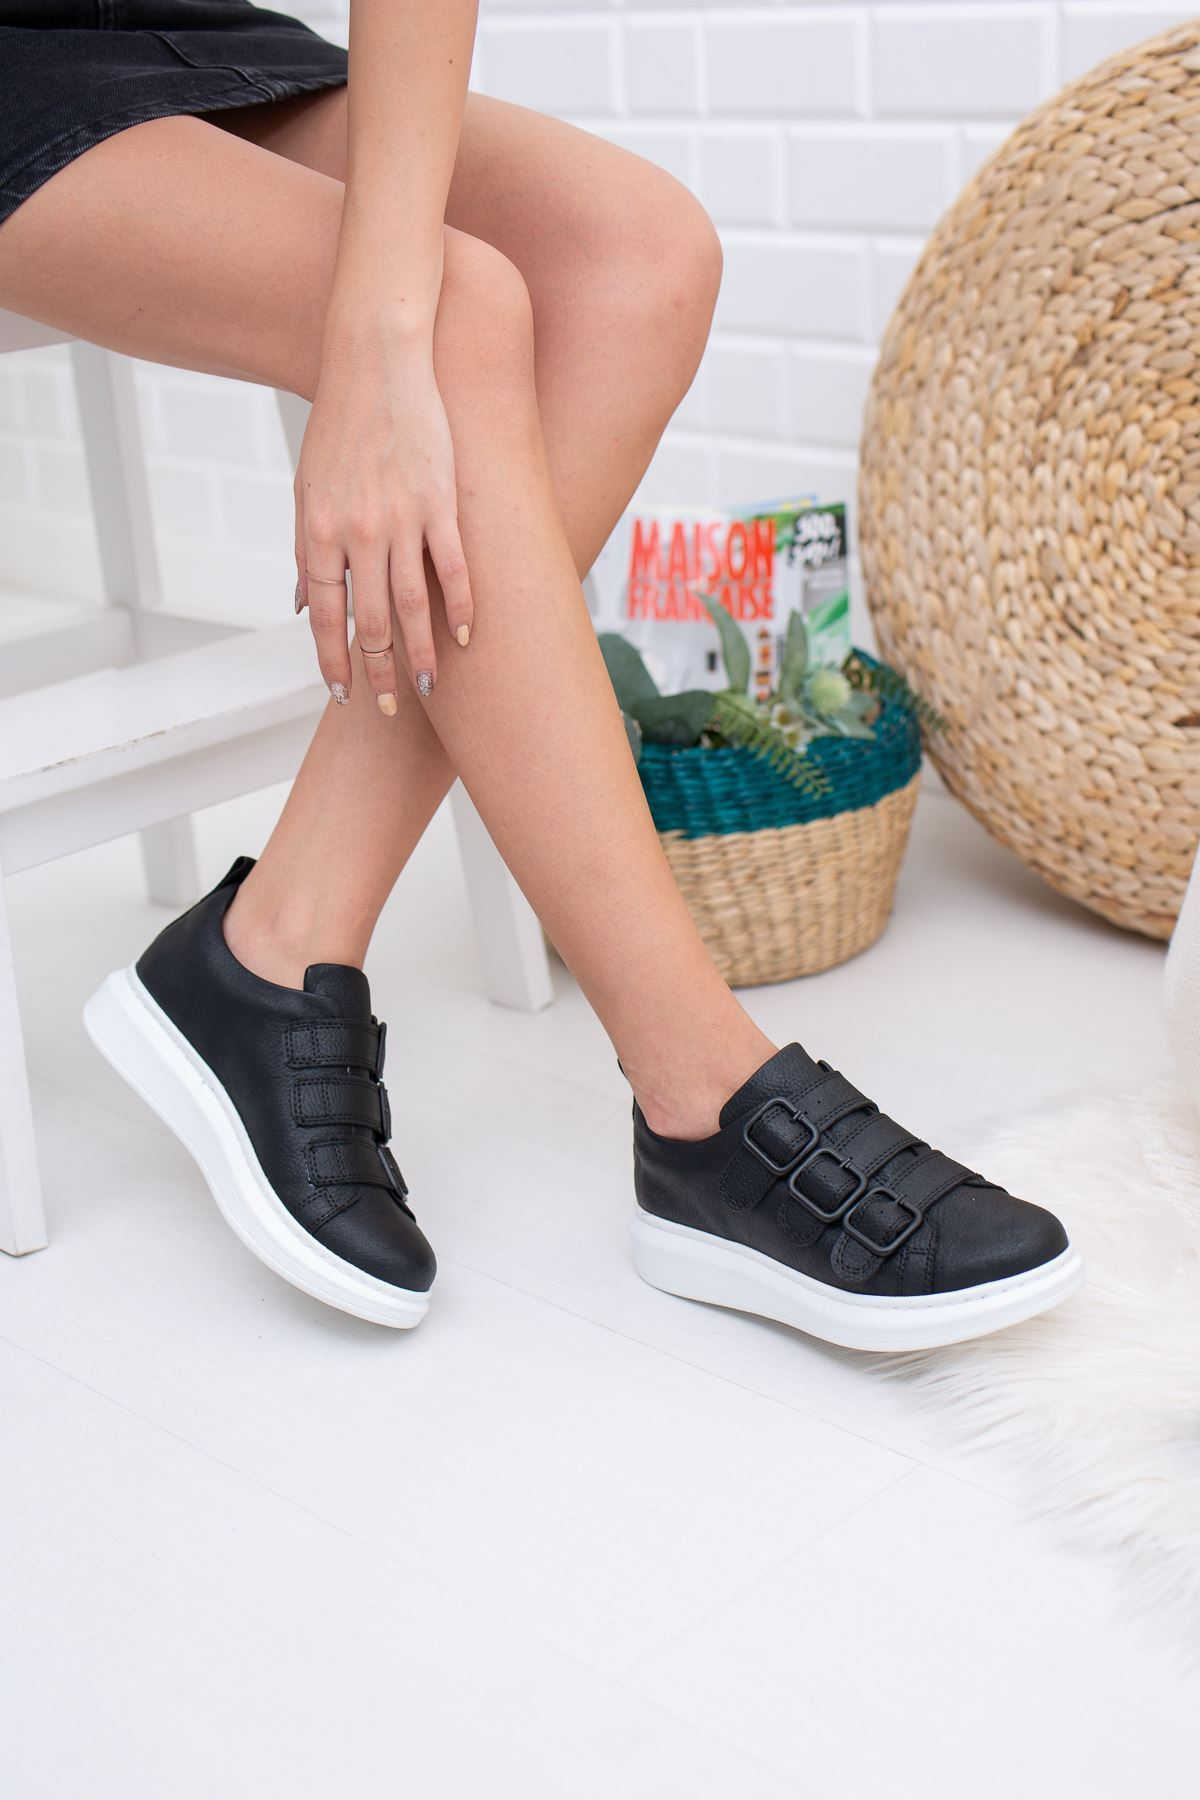 Gayle Siyah Kadın Sneakers